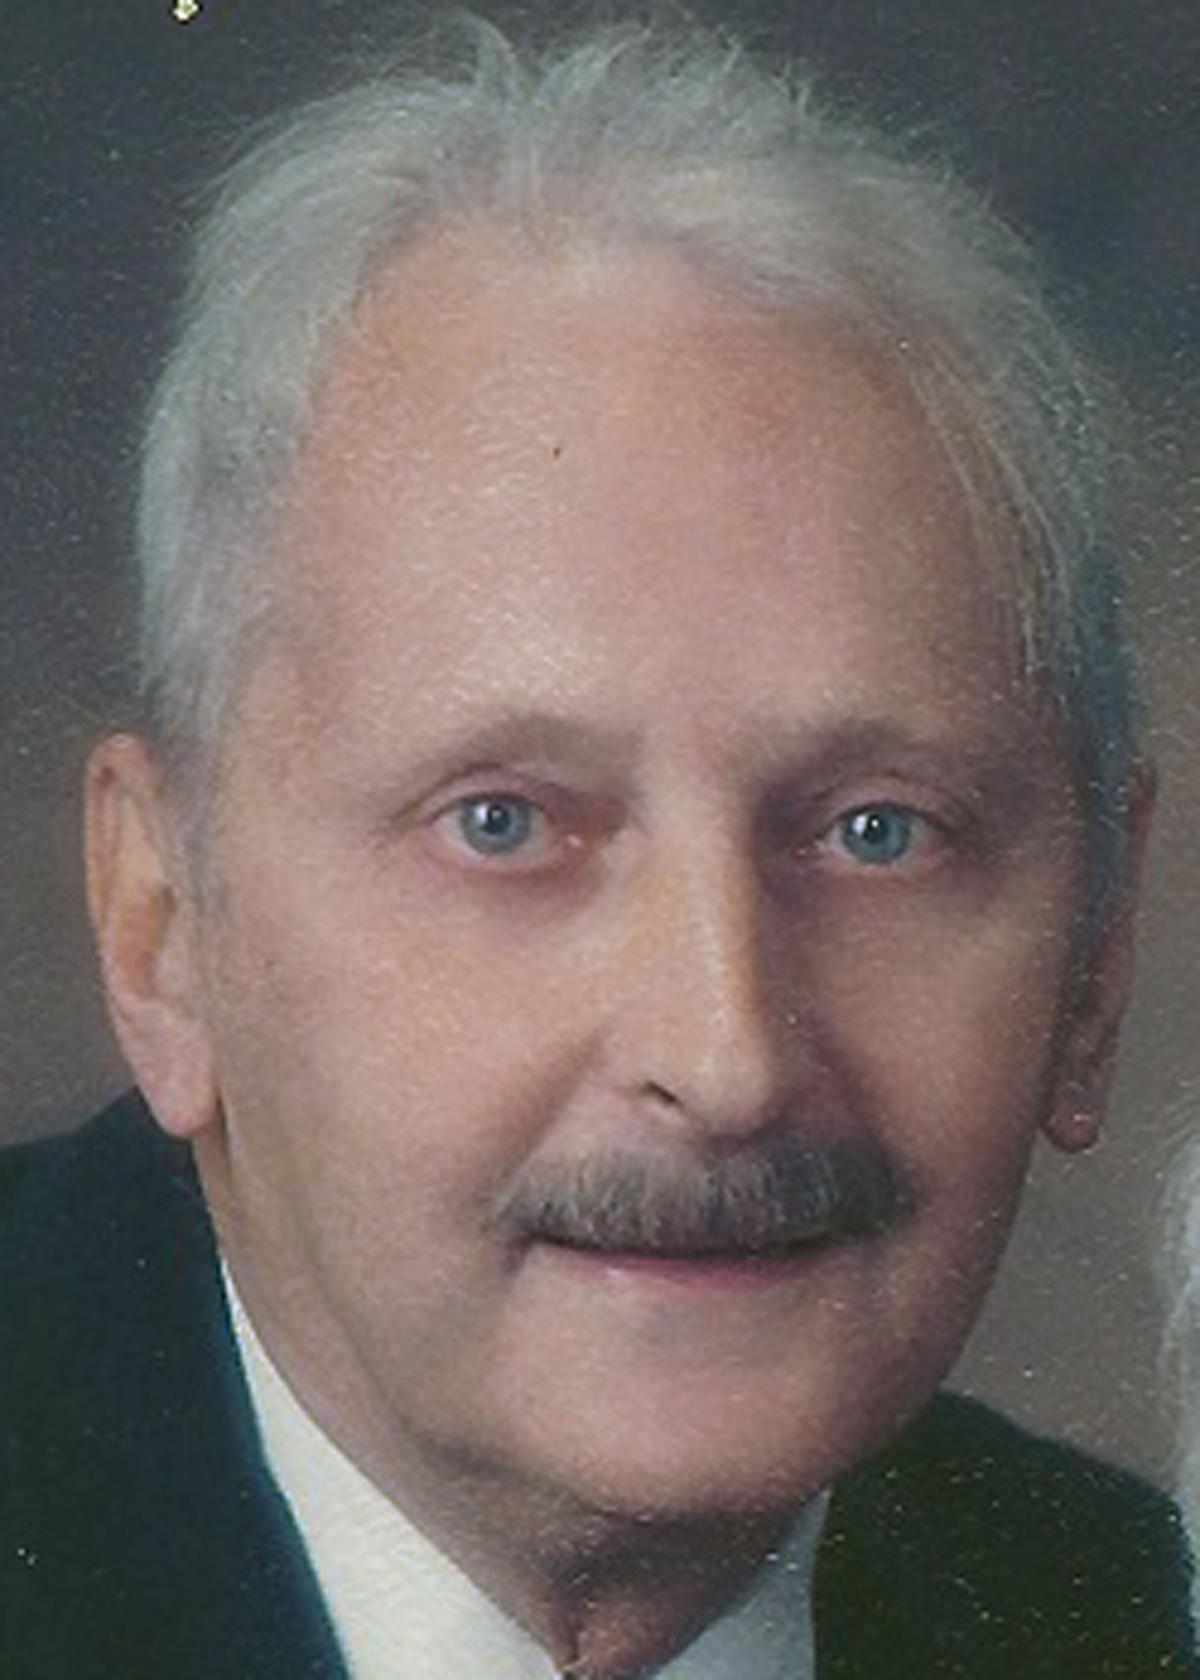 Nick Staihar